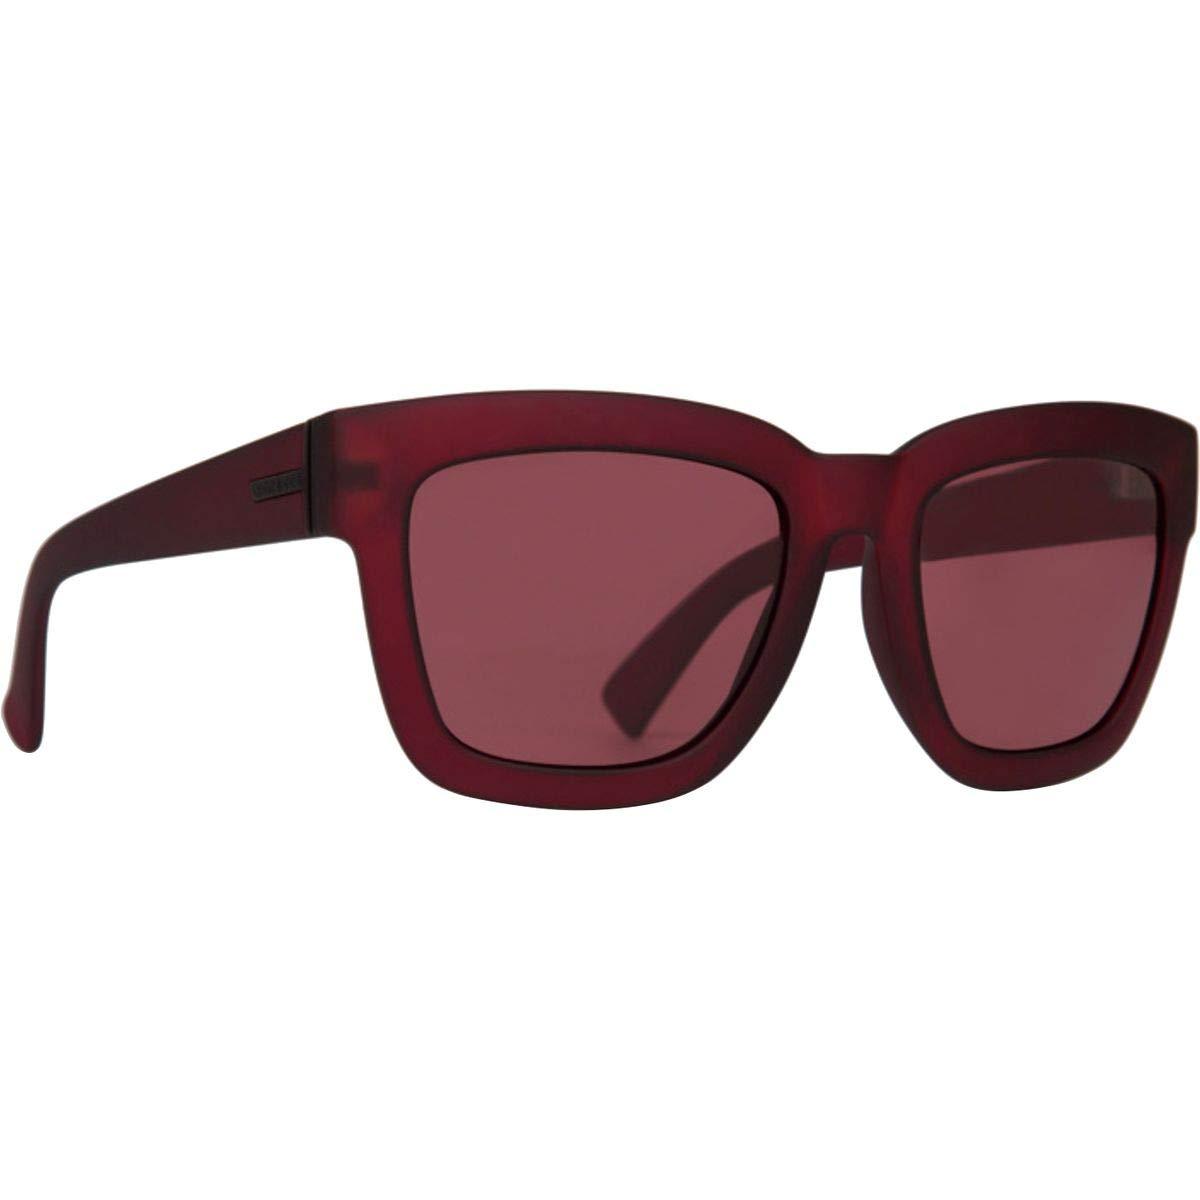 Vonzipper Big Boys' Juice Sunglasses,OS,Plum Satin/Grey-Rose